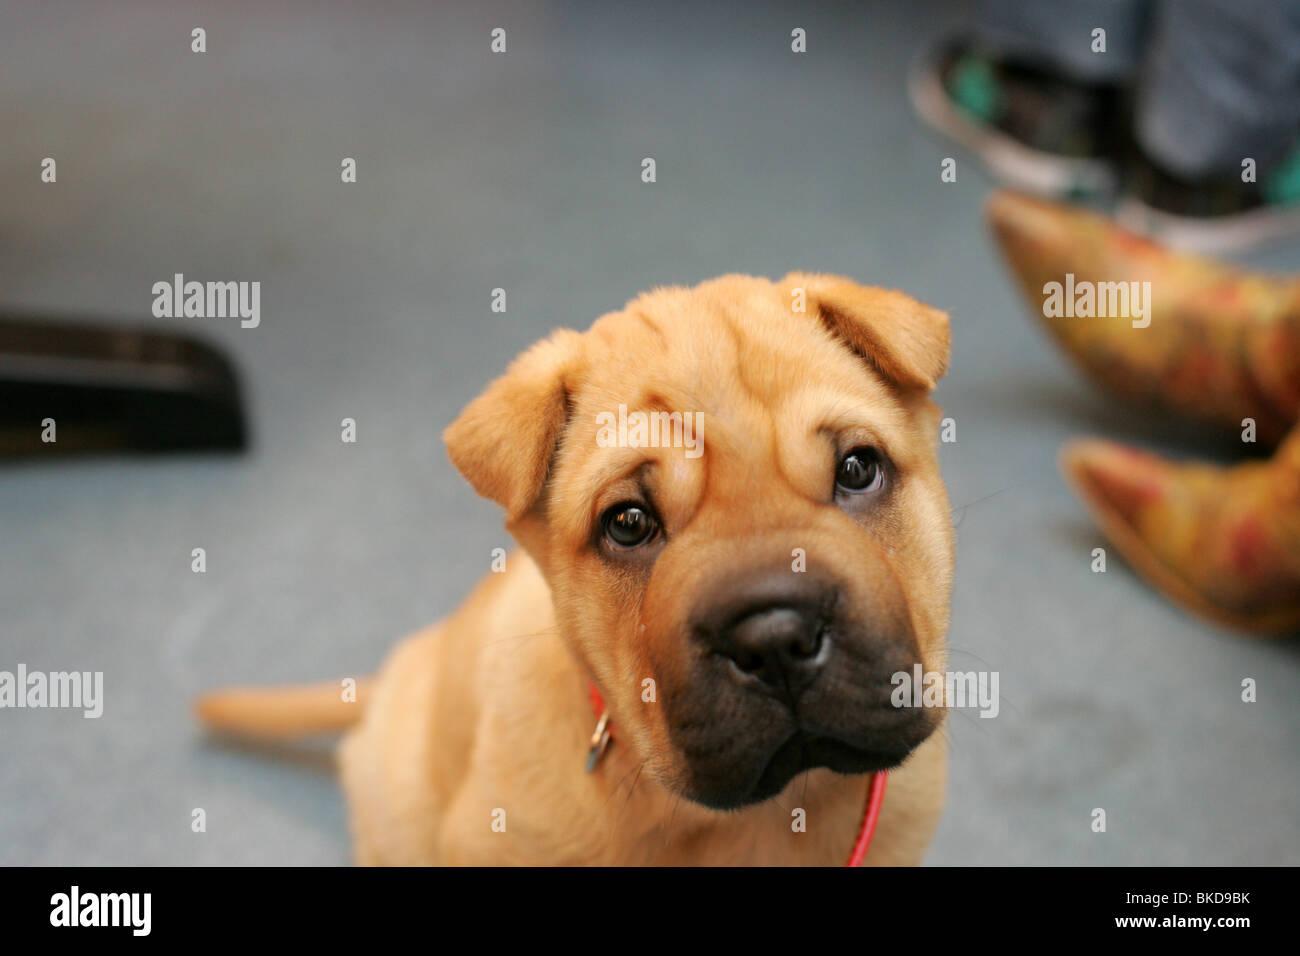 Shar Pei puppy baby looking at camera. - Stock Image